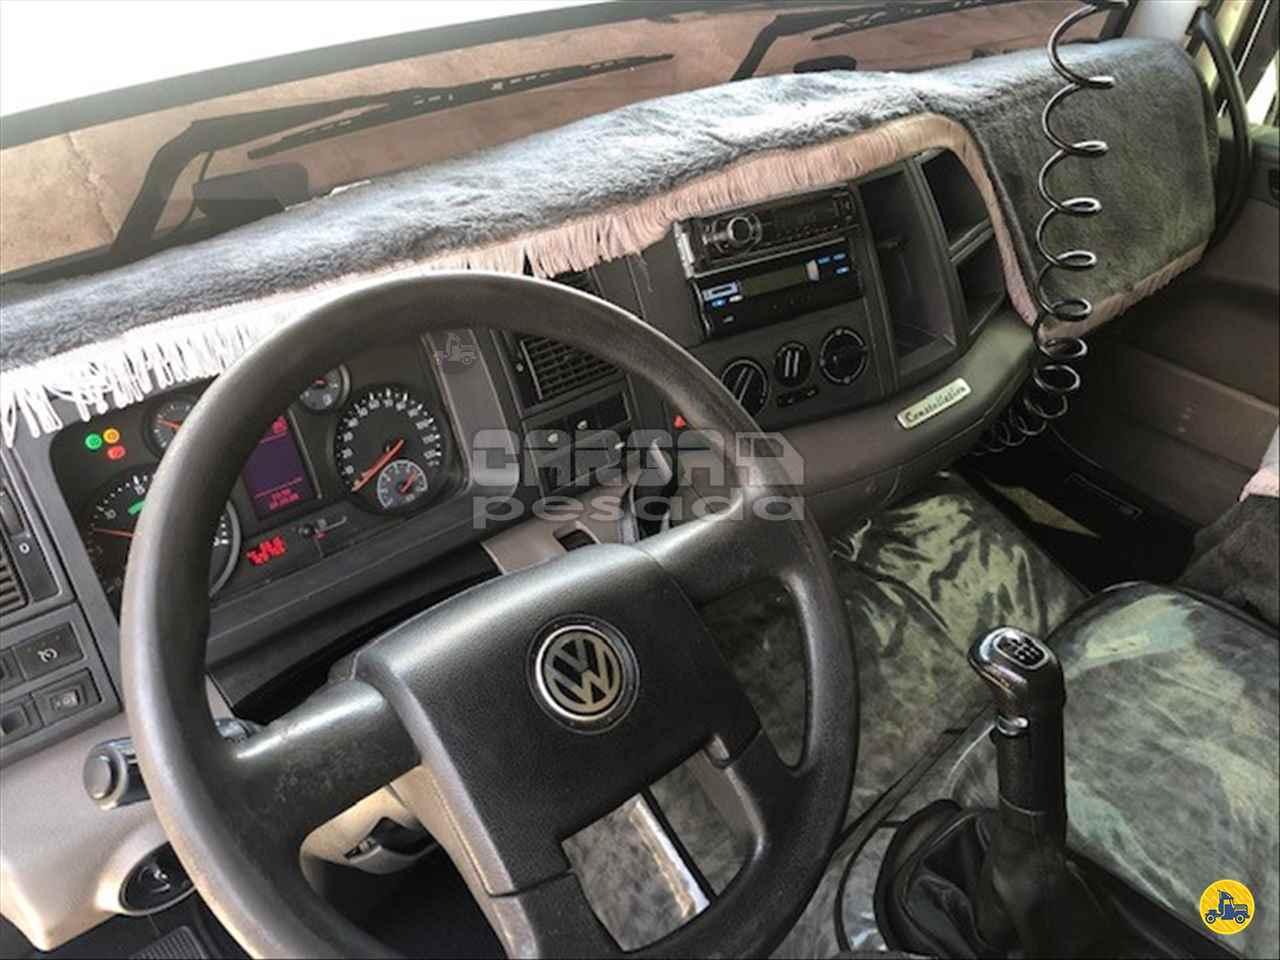 VOLKSWAGEN VW 19390 726000km 2012/2012 Carga Pesada Caminhões